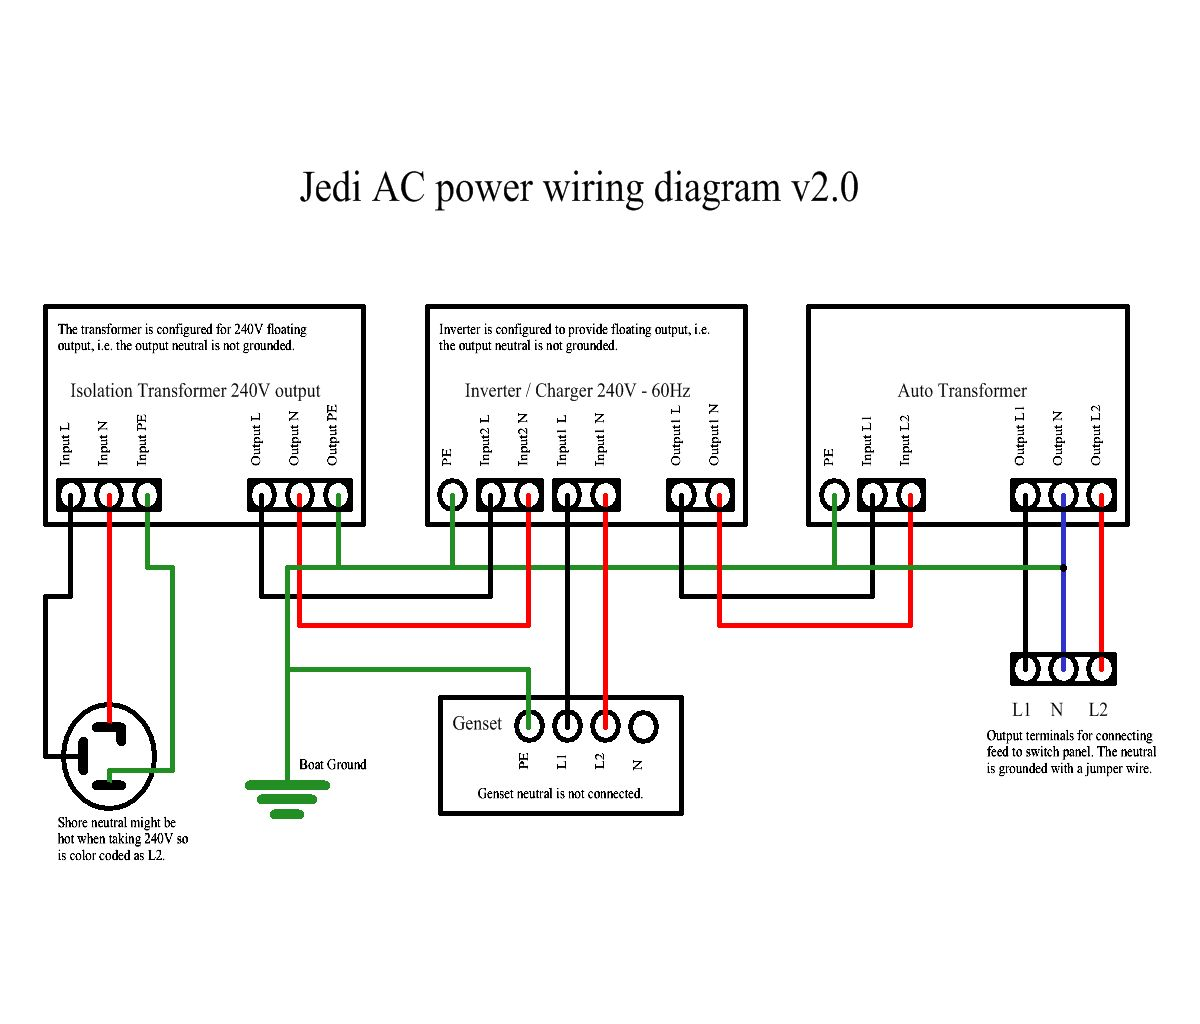 solar boat wiring diagram solar wiring diagrams online rib boat wiring diagram rib wiring diagrams online